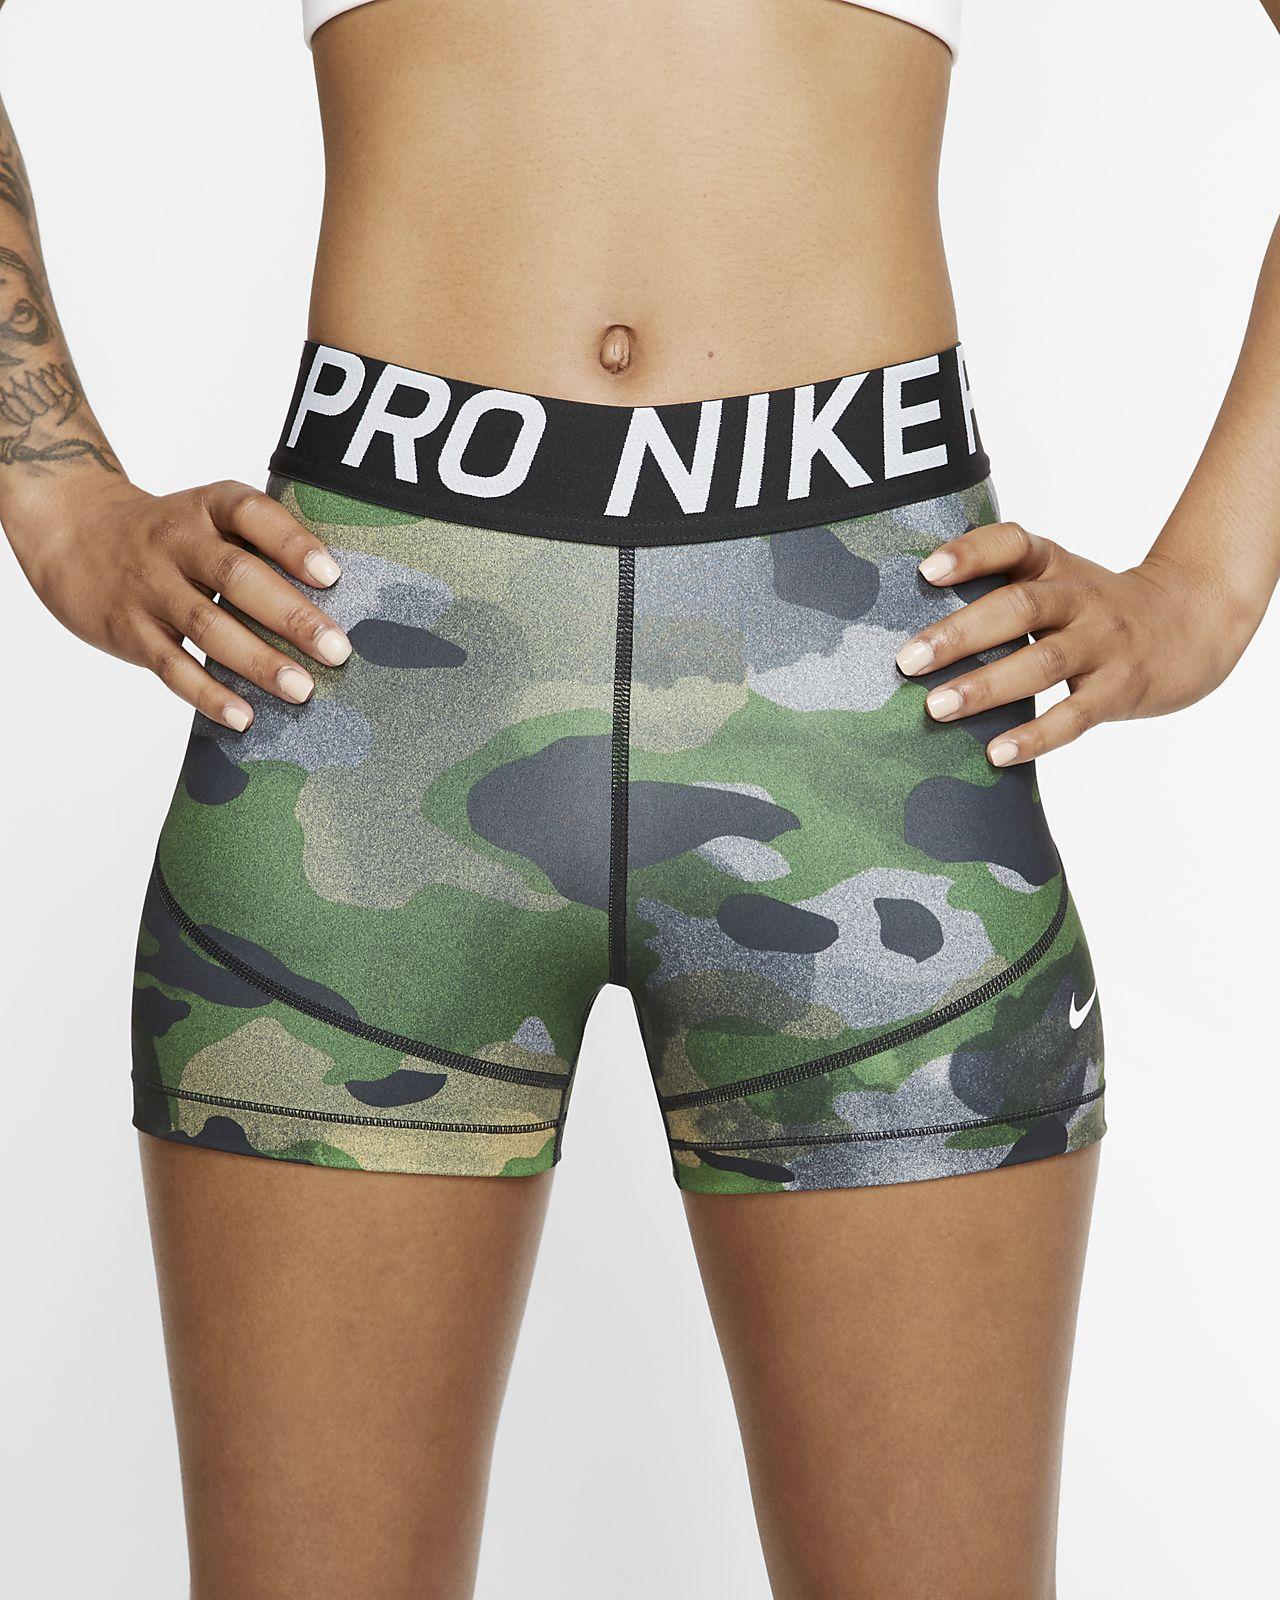 Nike Pro Camo-Shorts für Damen (ca. 7,5 cm)